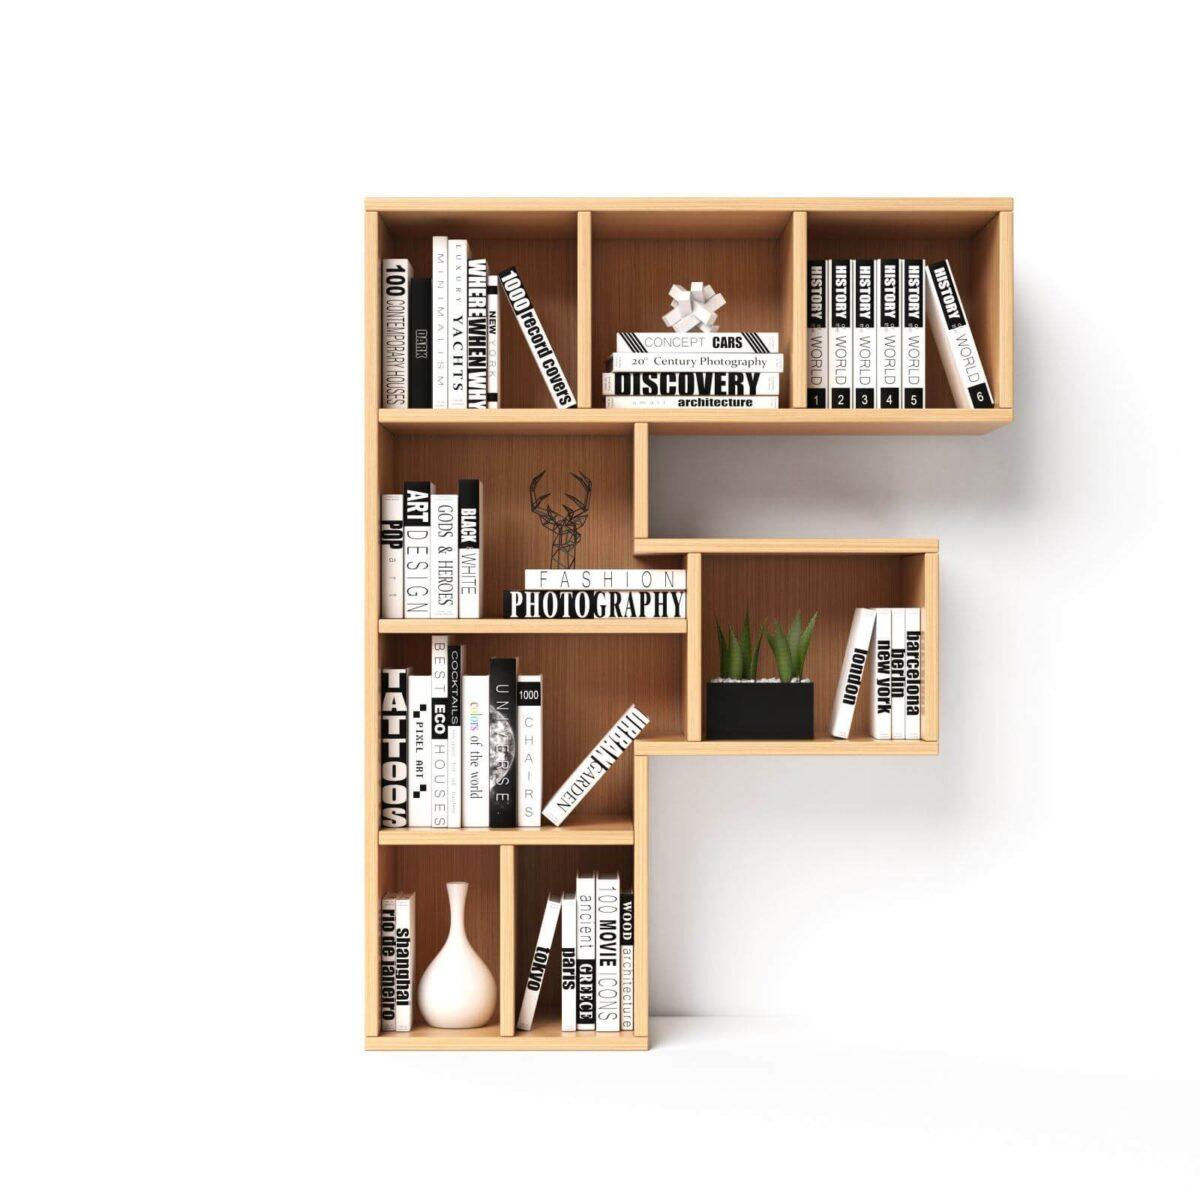 Bookshelves 3d font. Alphabet in the form of book shelves. Mockup font.  Letter F 3d rendering